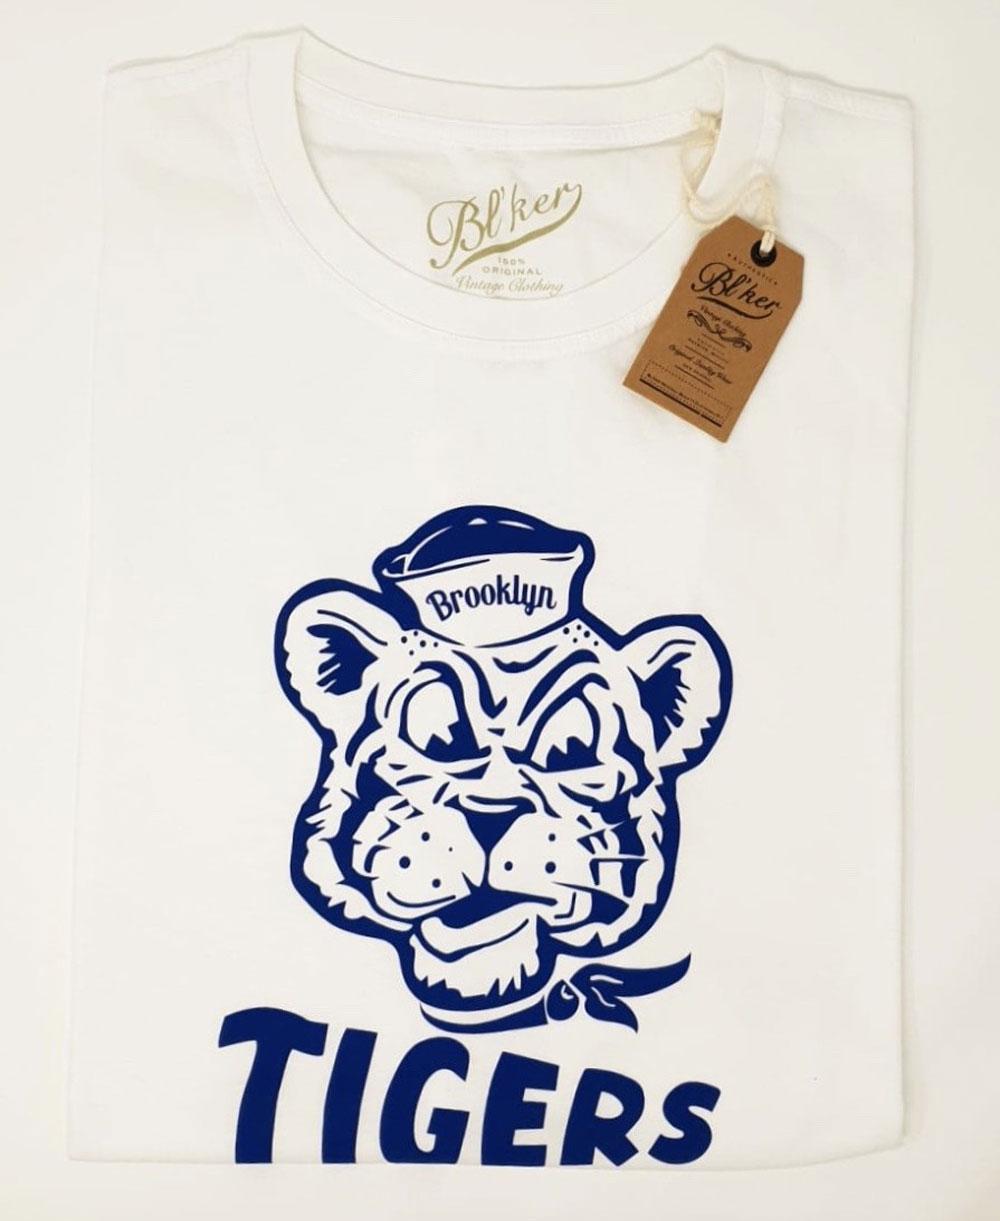 Brooklyn Tiger Camiseta Manga Corta para Hombre White